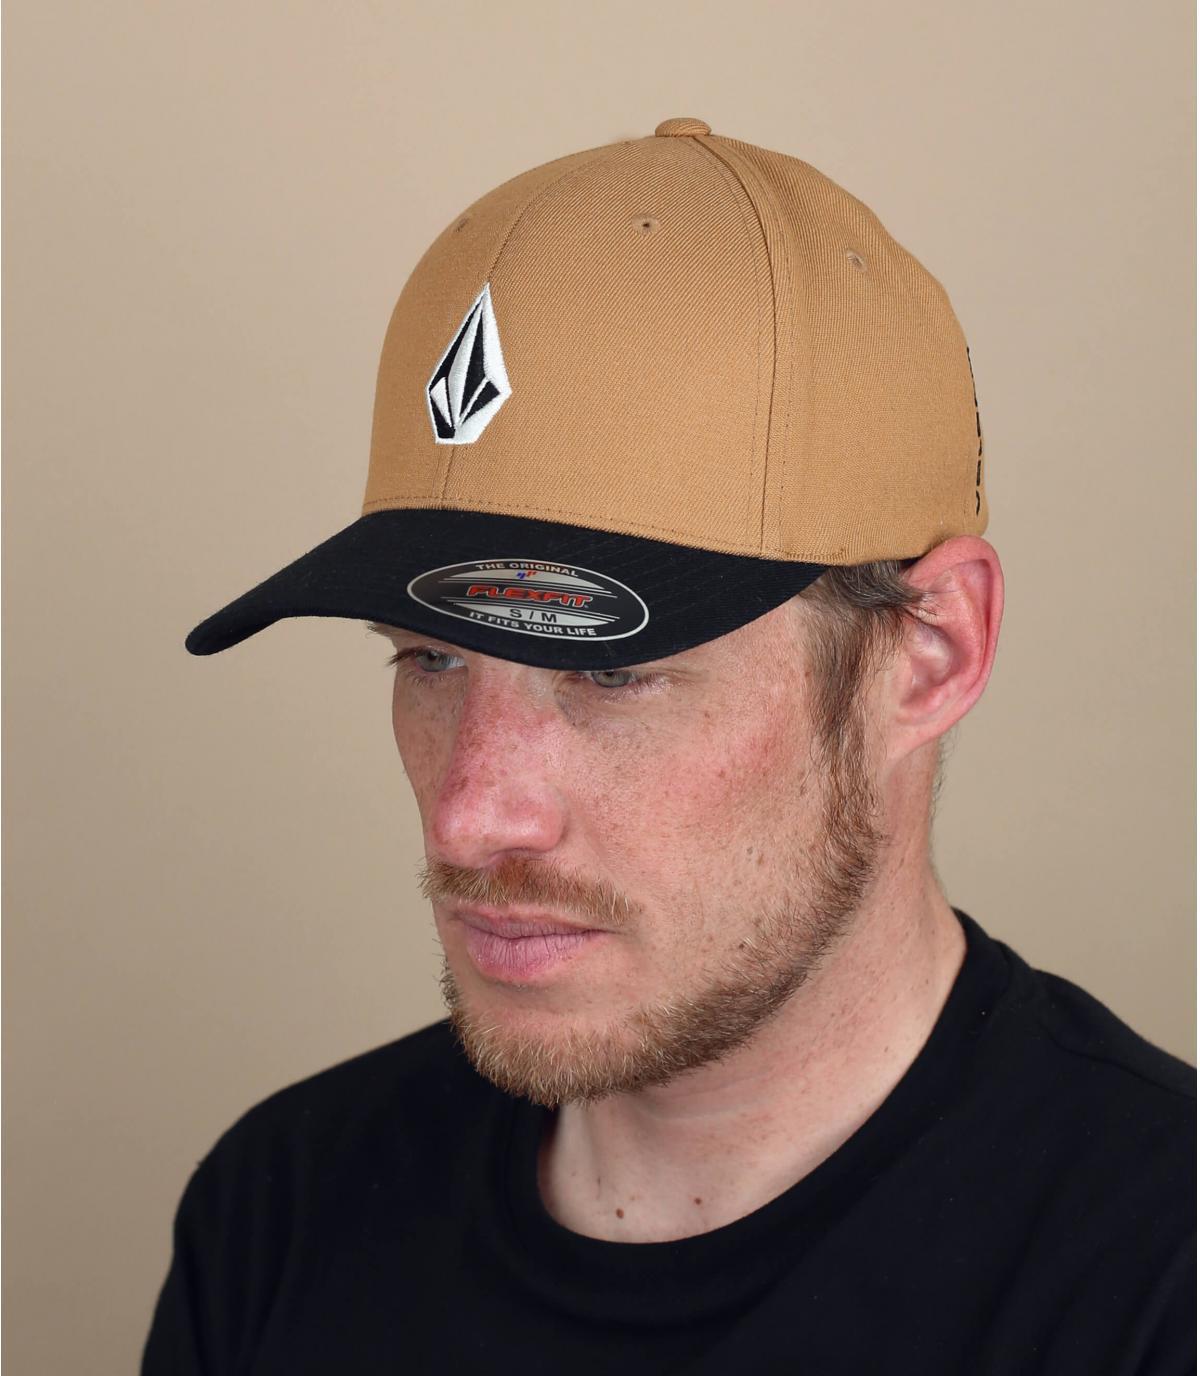 Volcom cappellino beige nero